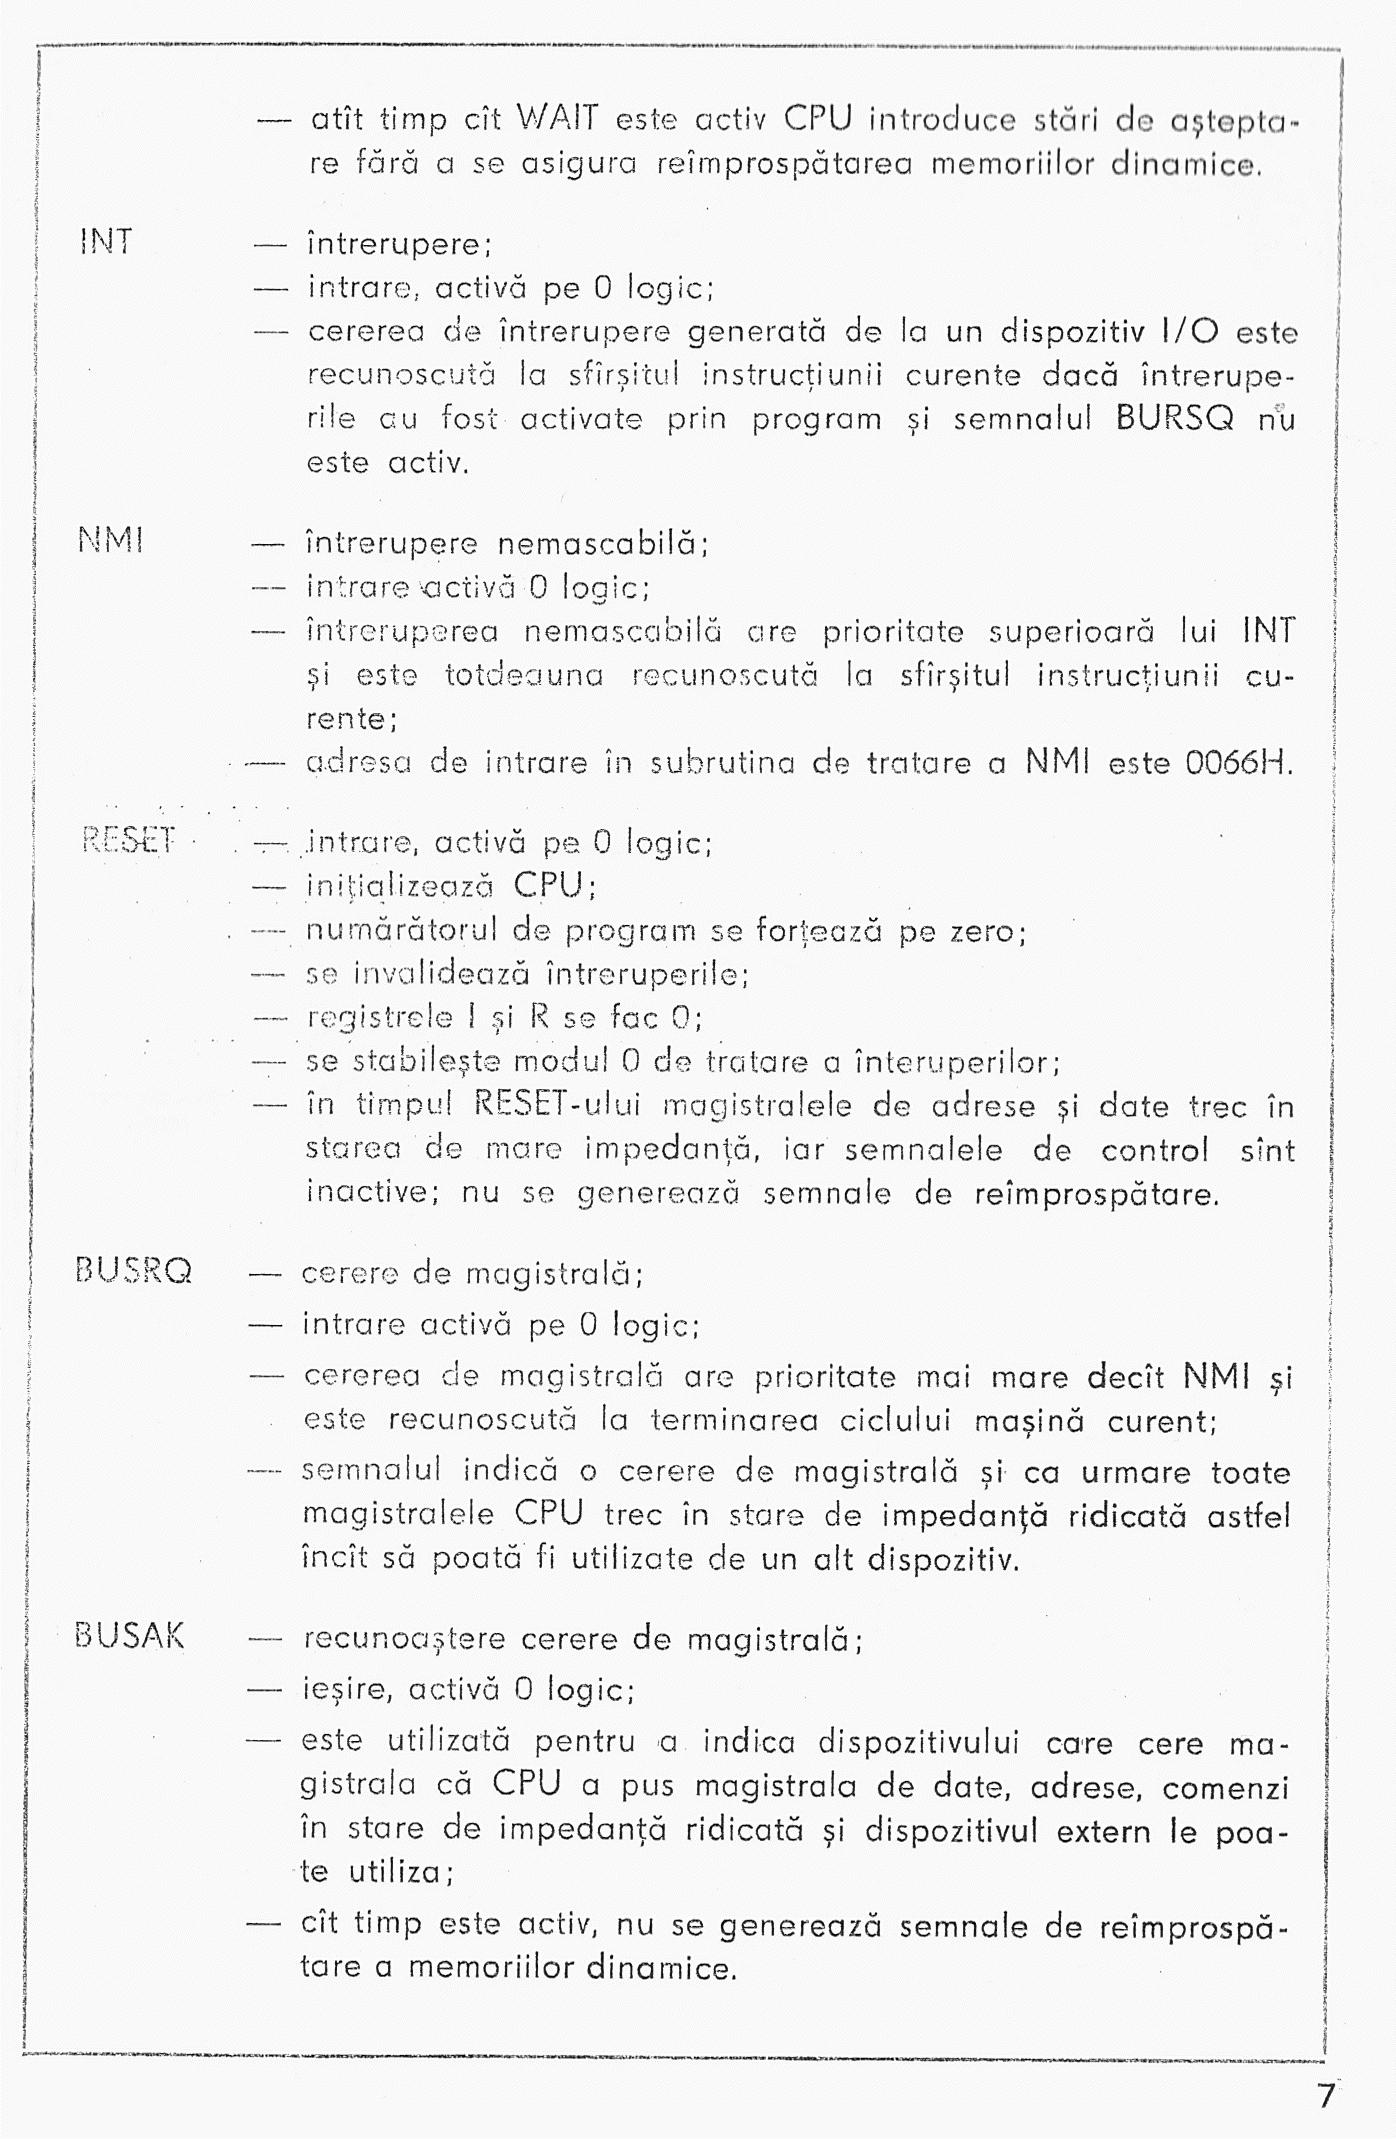 dax 30 semnale